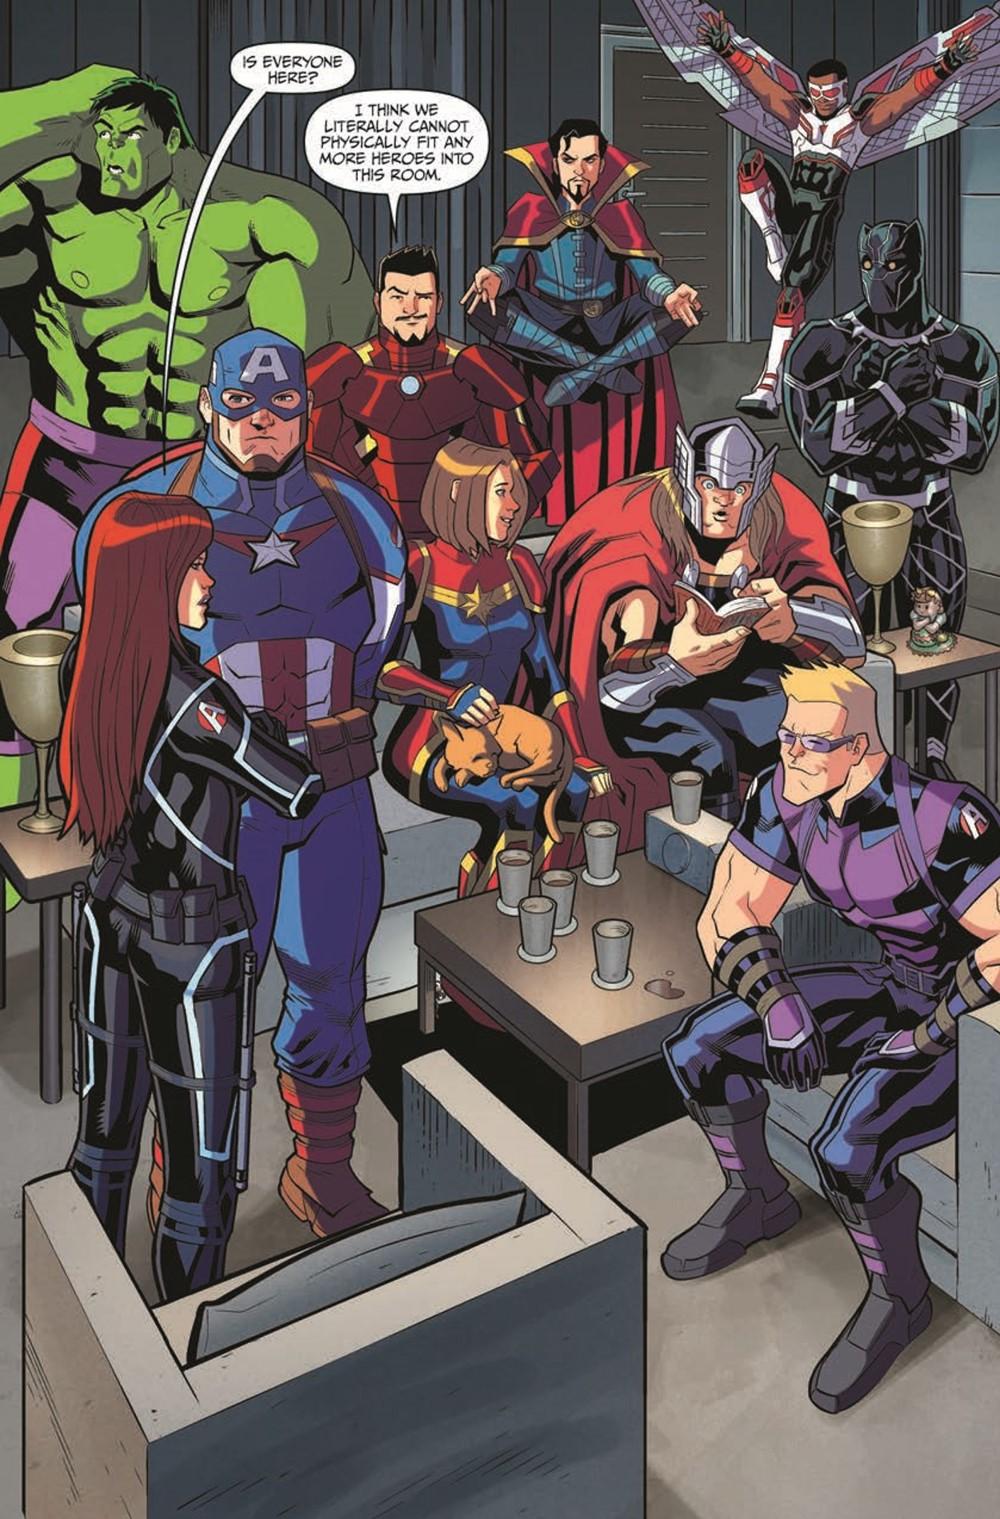 MarvelAction_Avengers_Vol.1_OffTheClock_TPB_pr-4 ComicList Previews: MARVEL ACTION AVENGERS VOLUME 5 OFF THE CLOCK TP